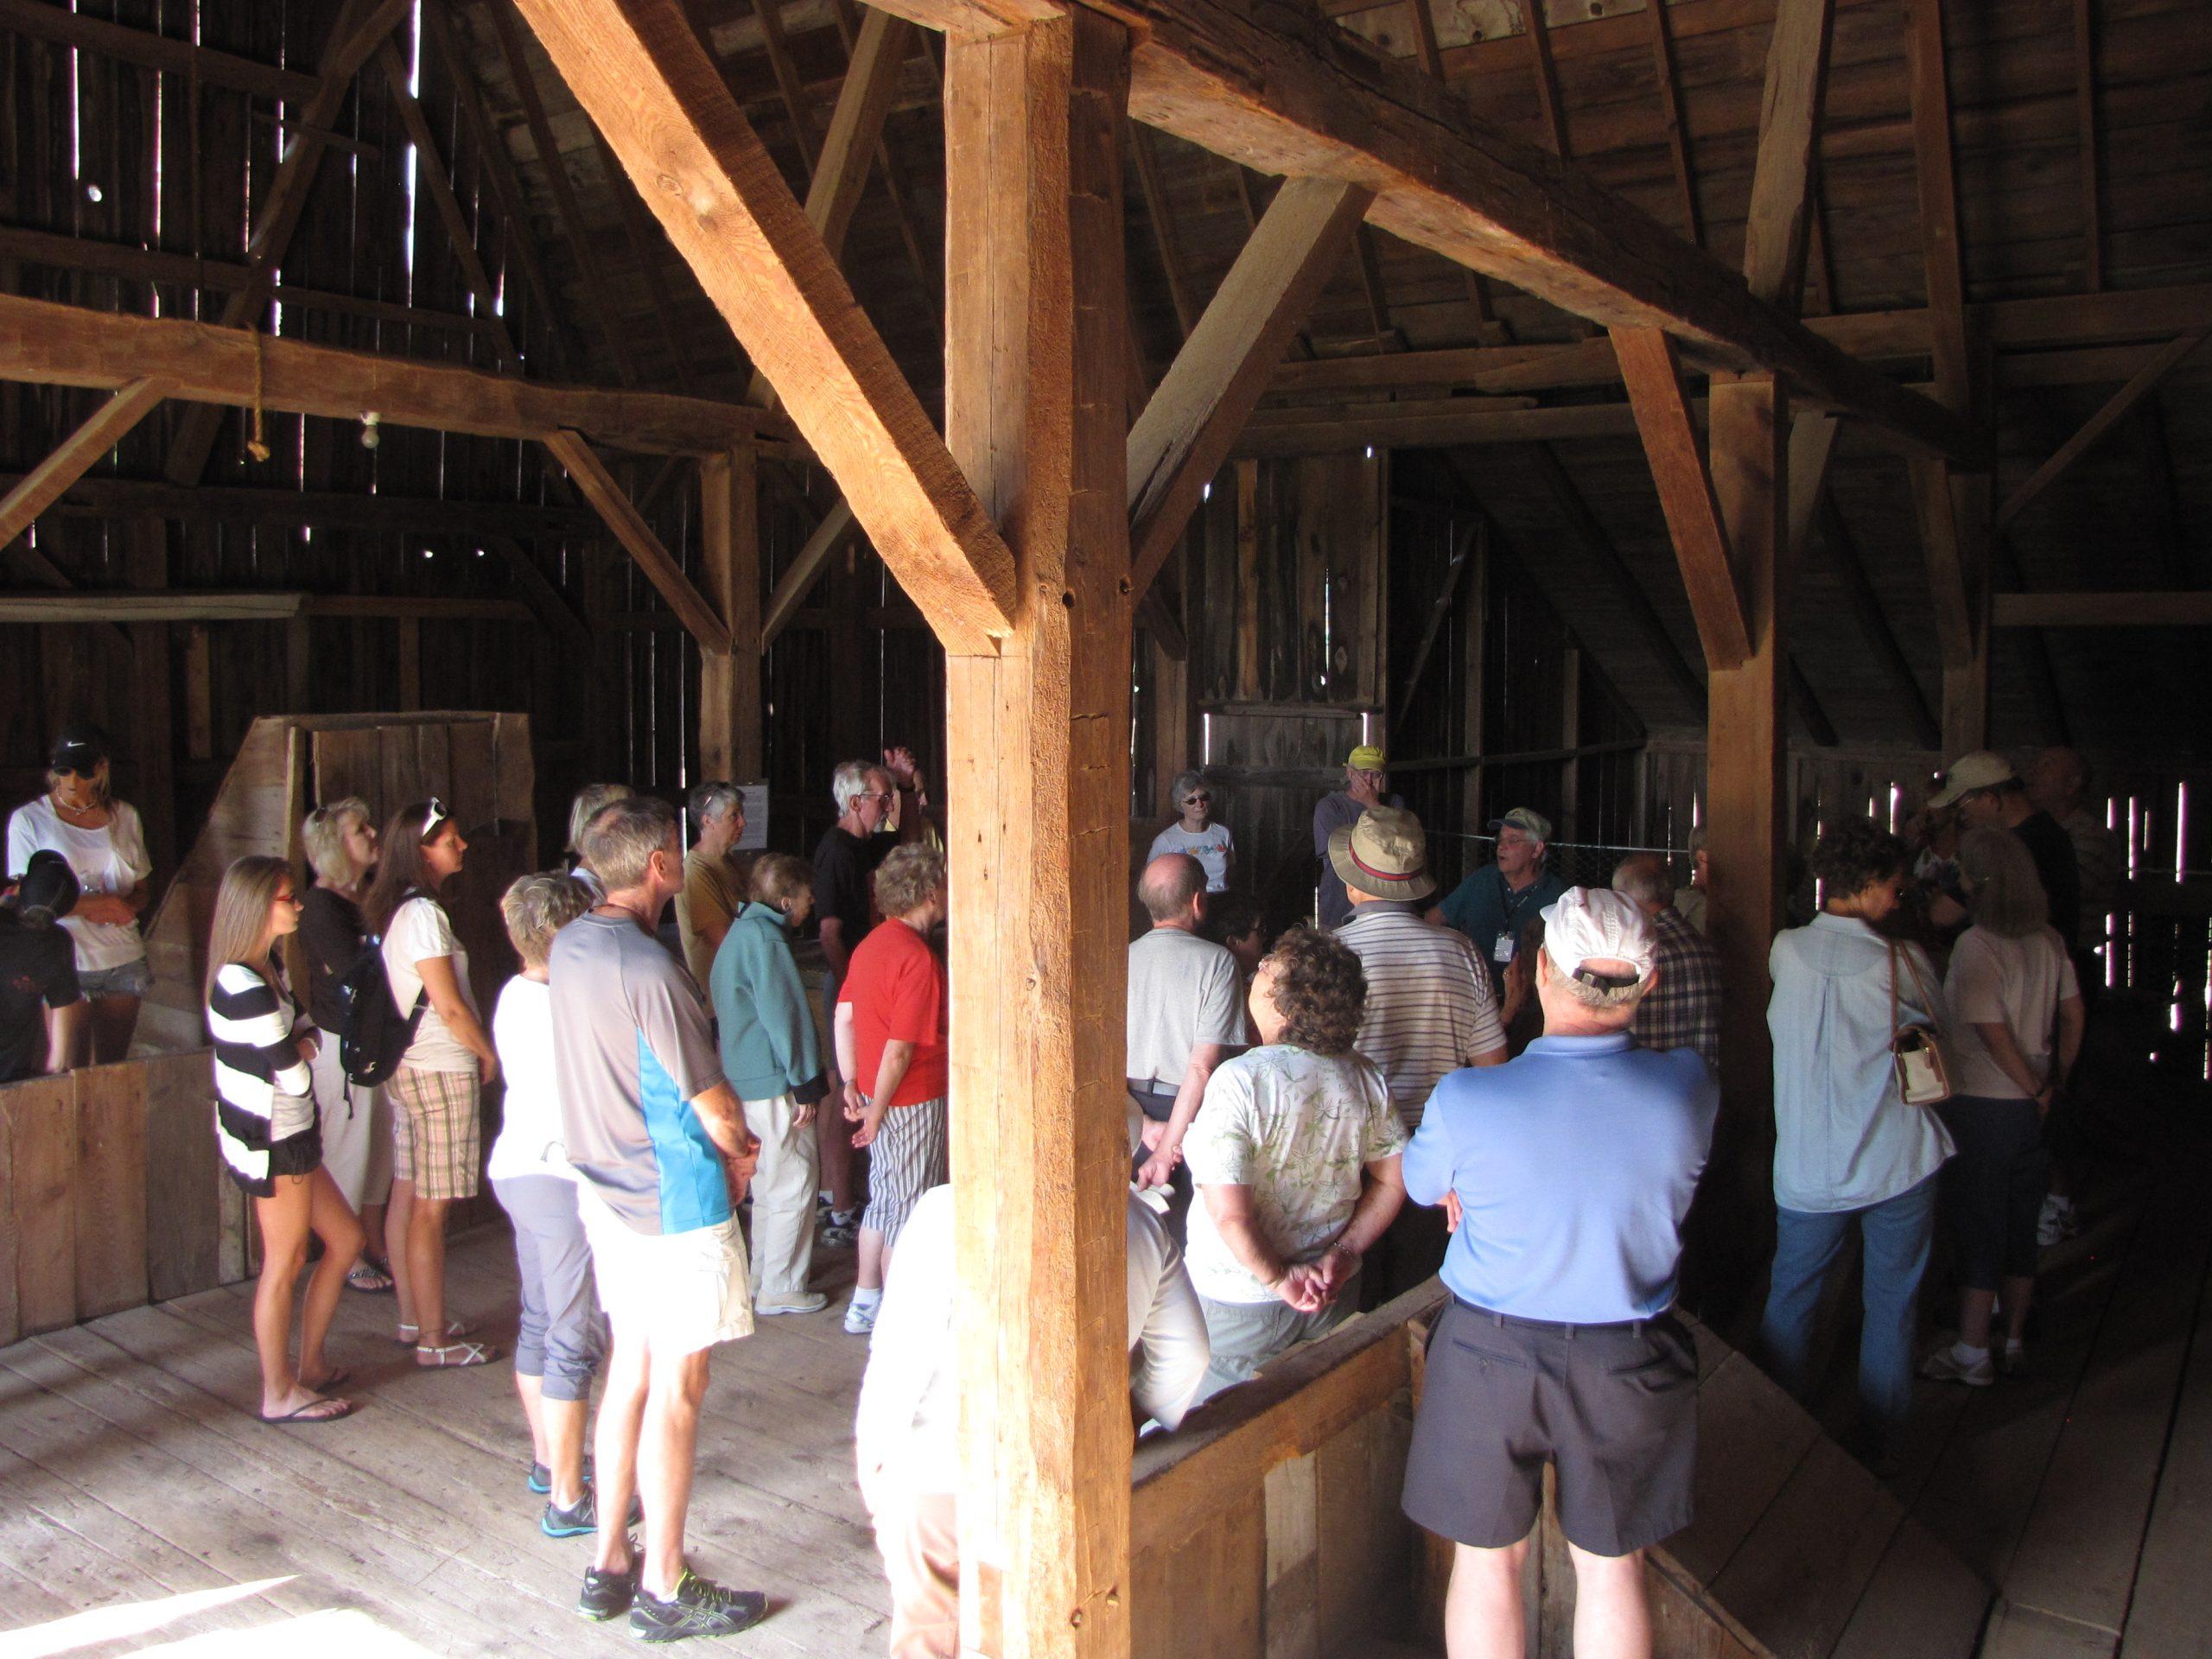 Port Oneida historic barn tour